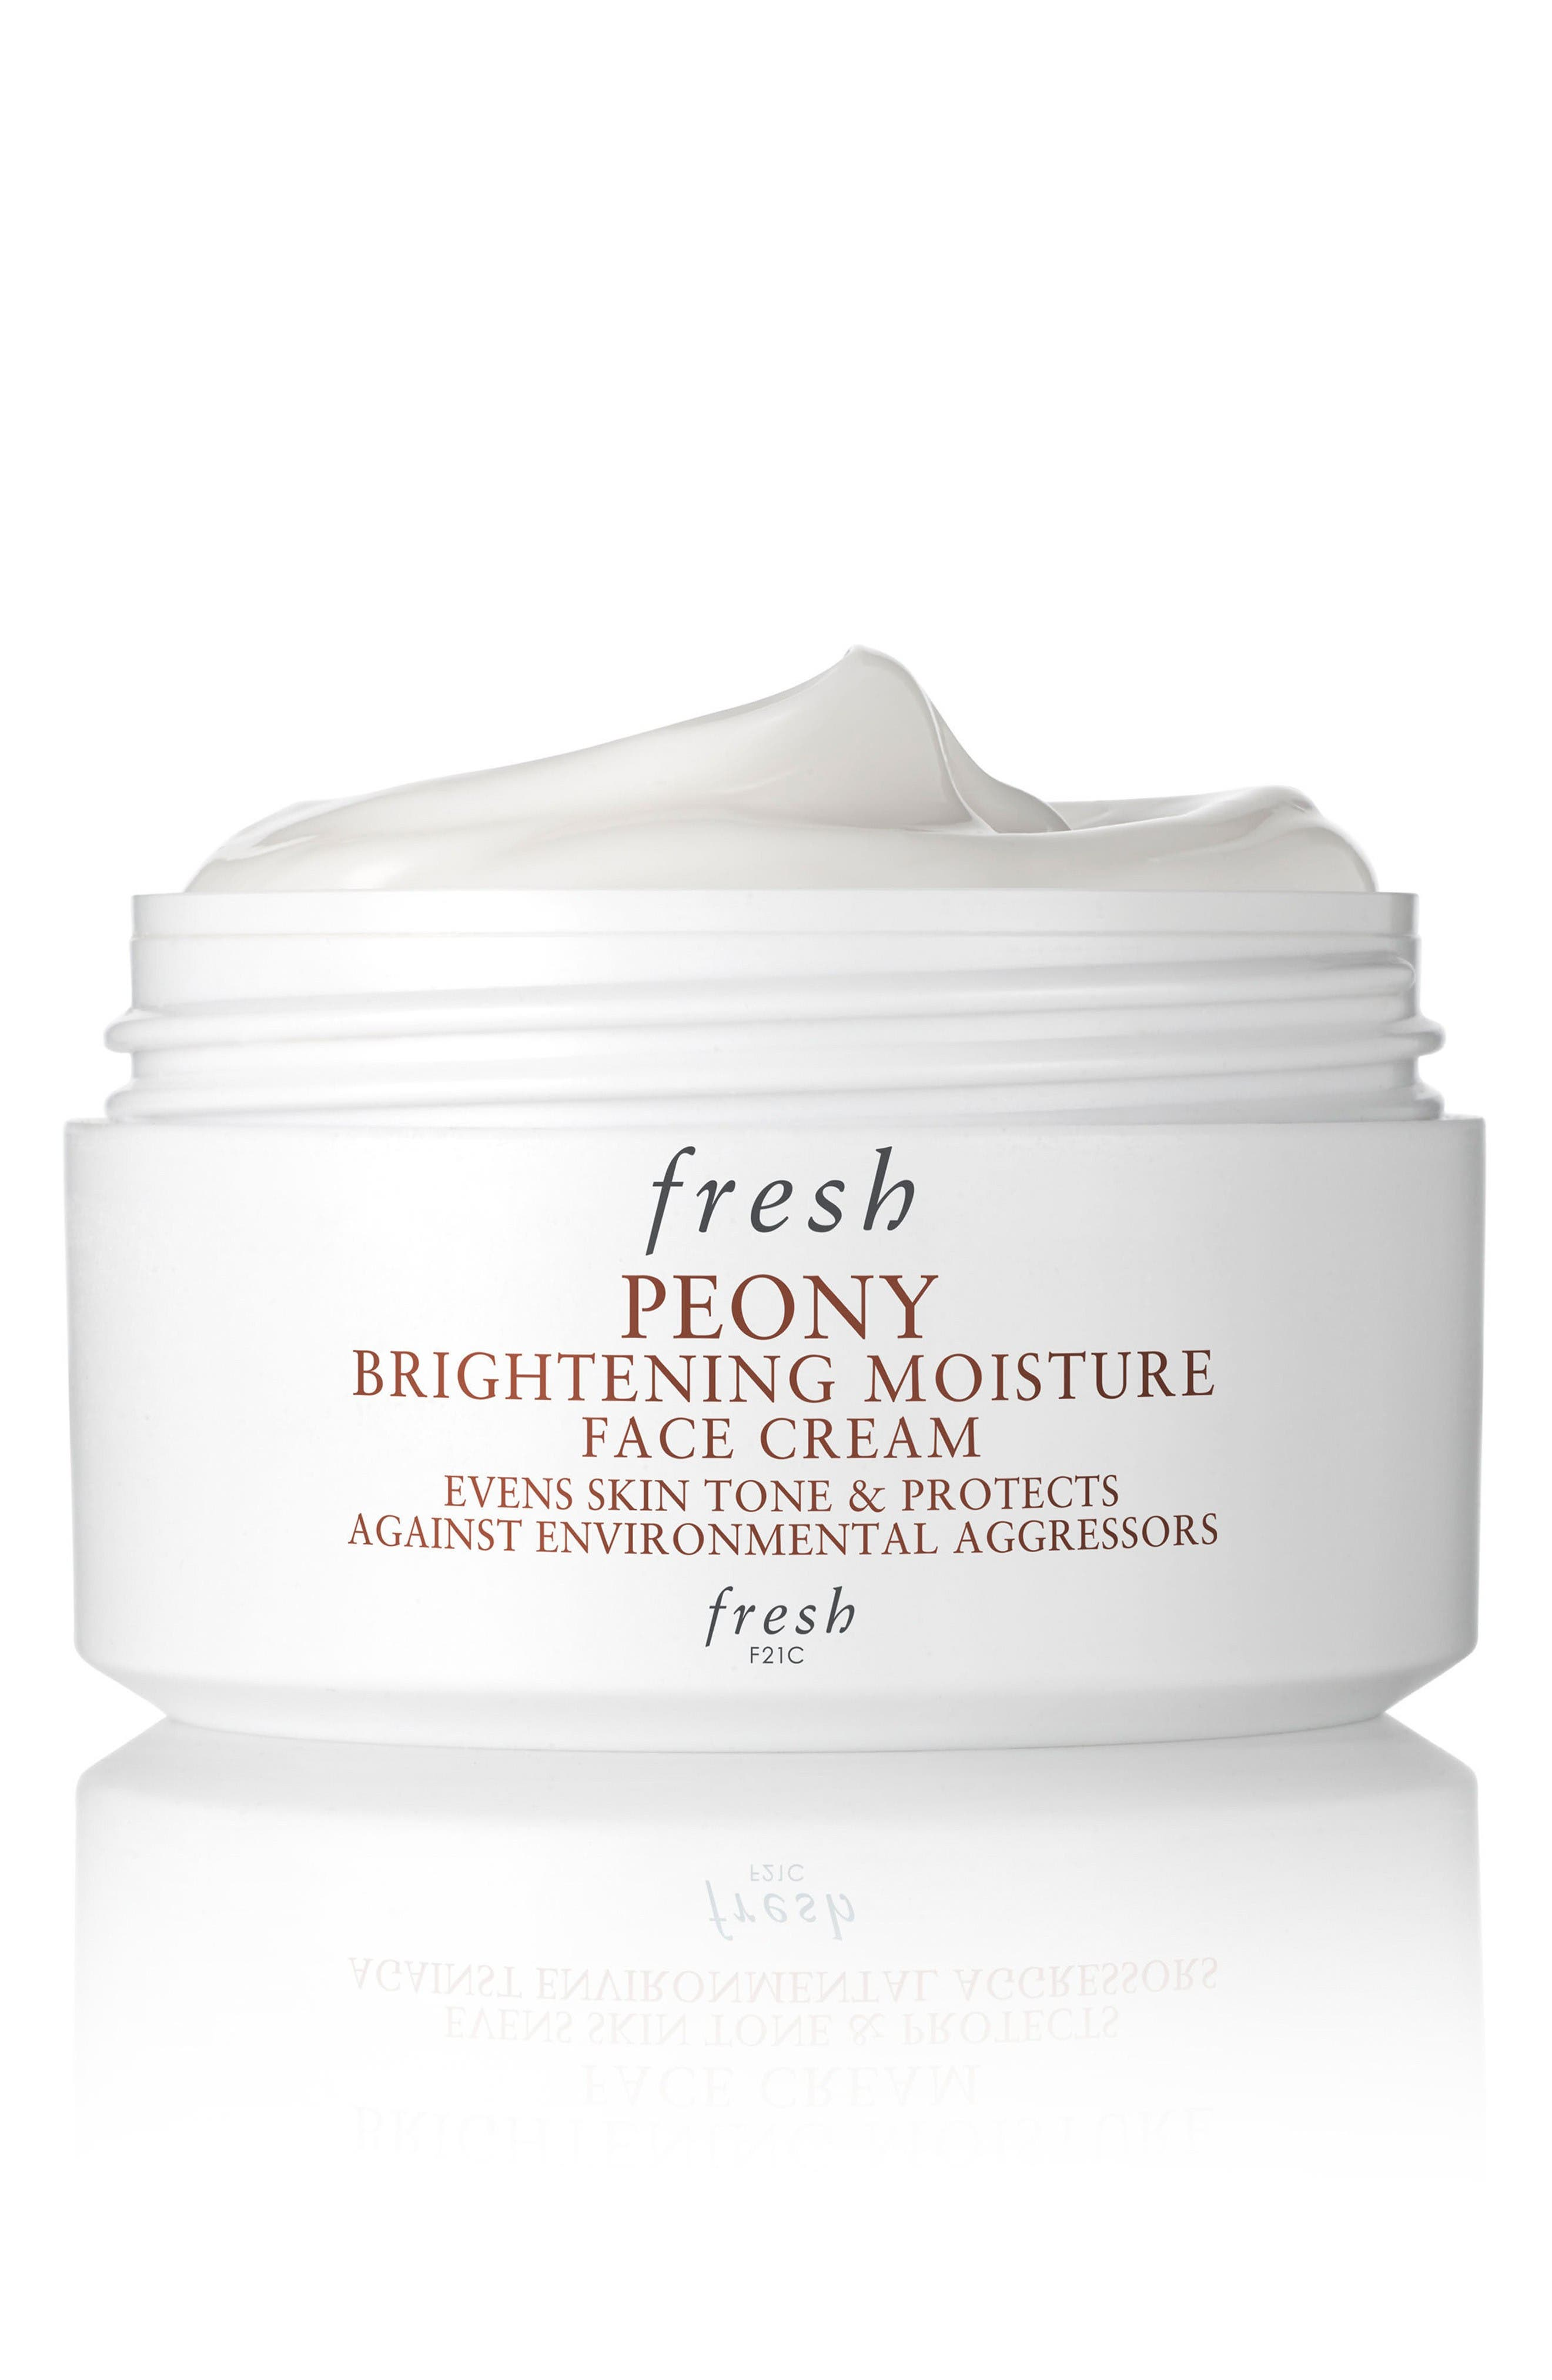 Fresh® Peony Brightening Moisture Face Cream